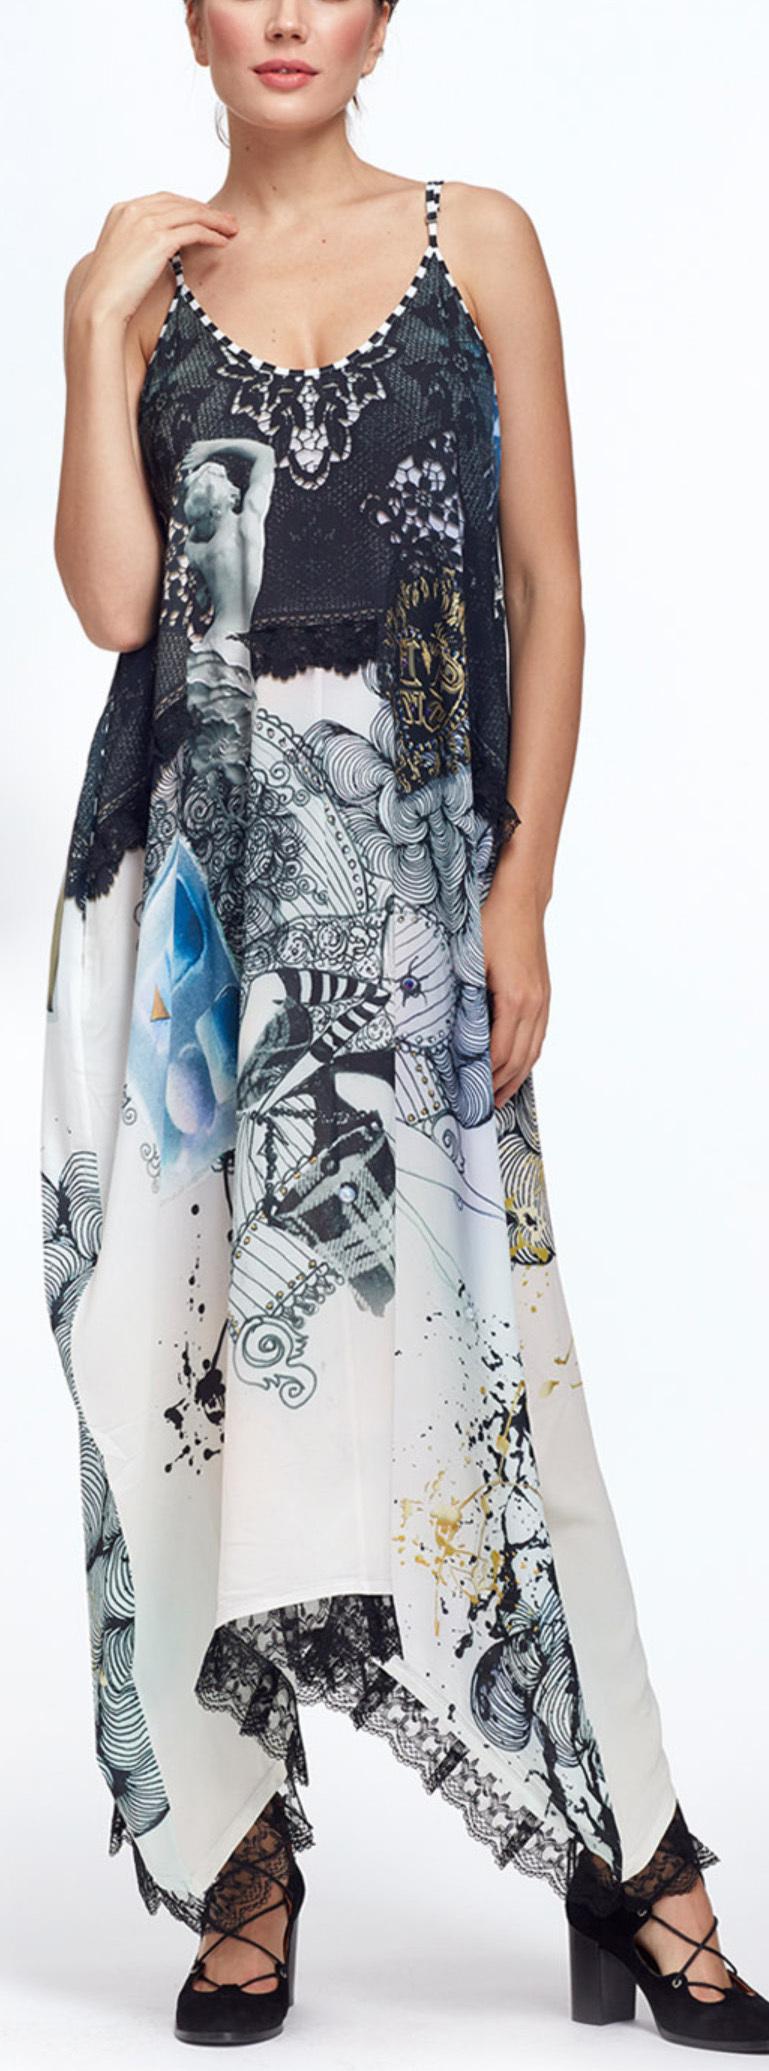 IPNG: Love Me Black Bejeweled Illusion V-Cut Maxi Dress IPNG_LMBDVN-078